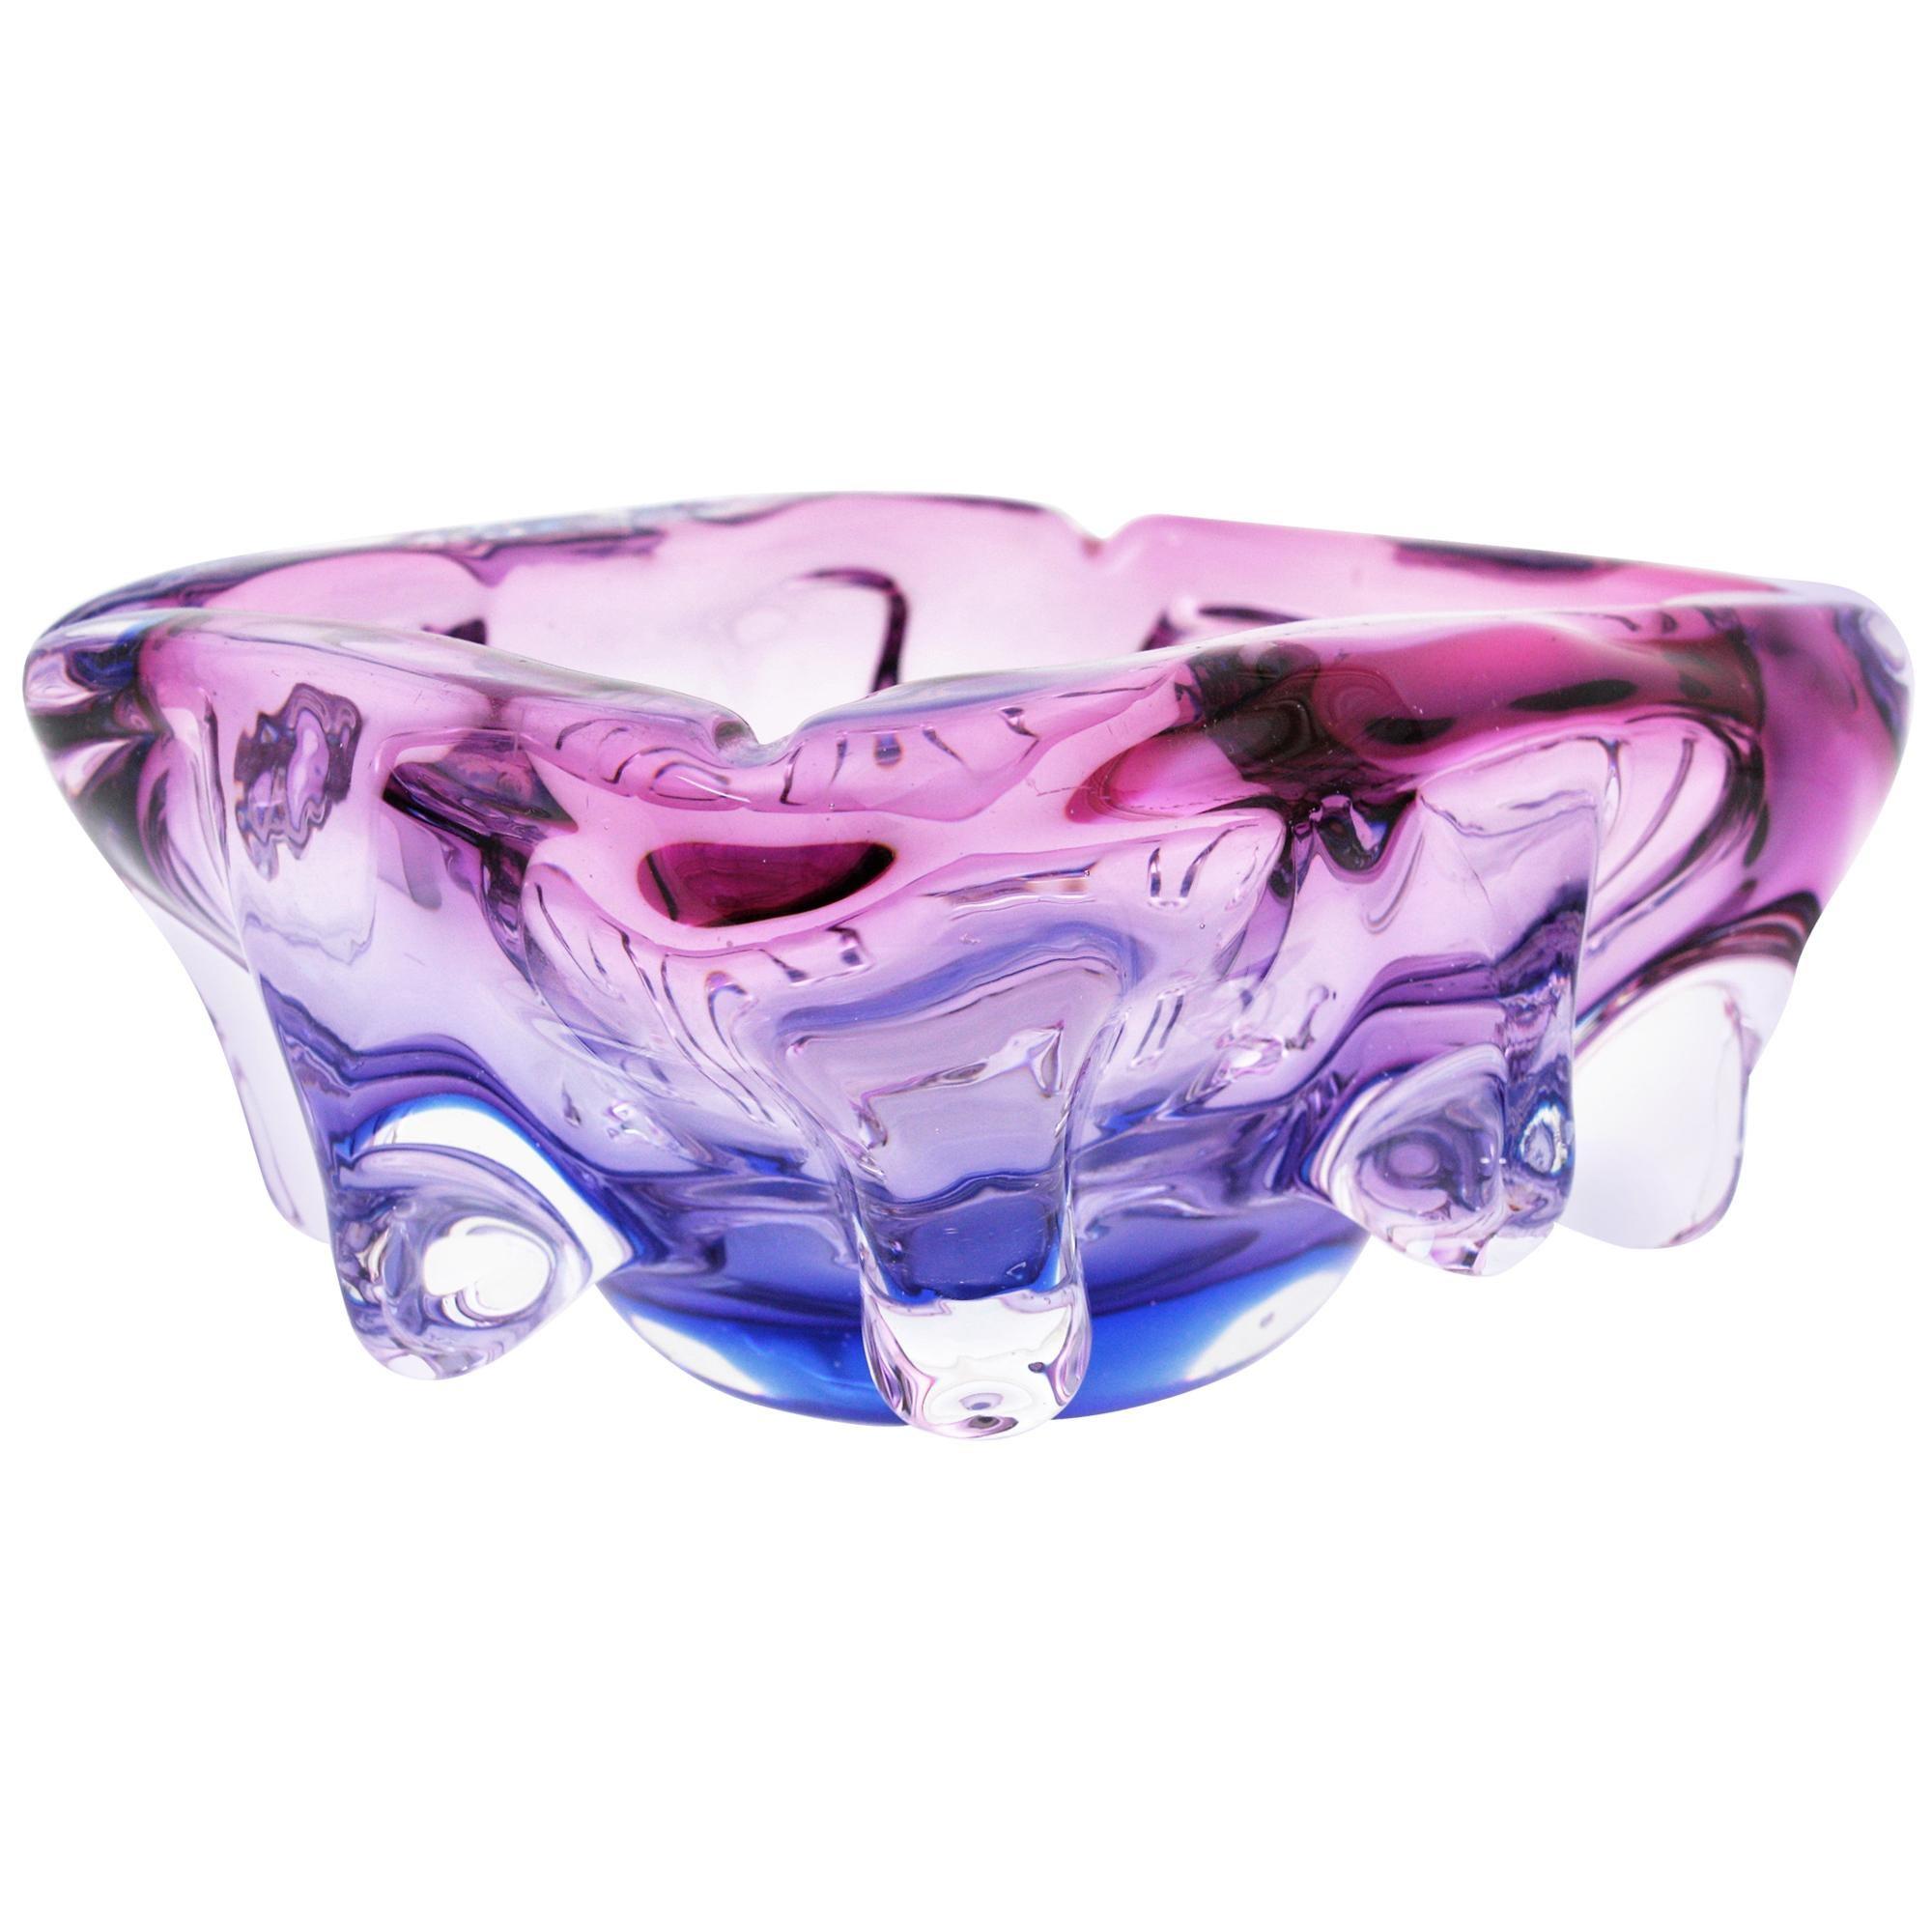 Seguso Murano Pink, Purple & Blue Sommerso Glass Centerpiece Bowl, 1960s